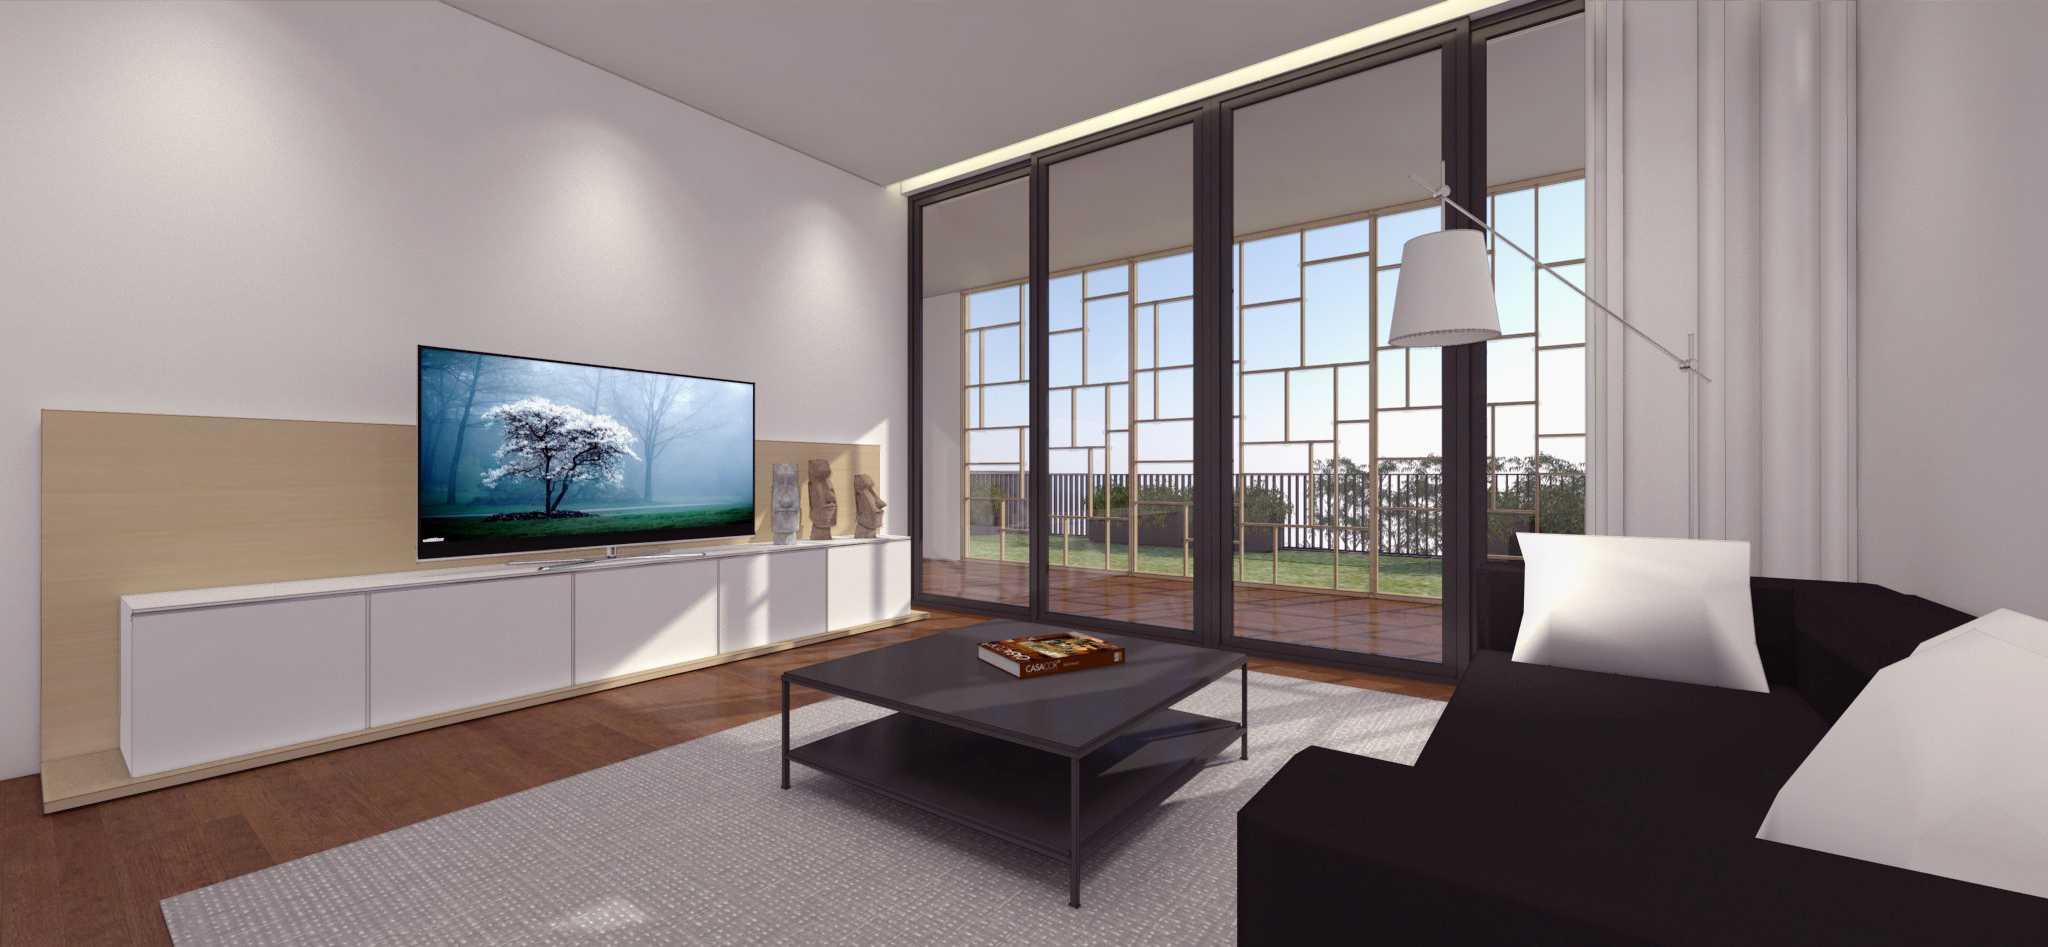 Ari Wibowo Design (Aw.d) Rk House Jakarta, Indonesia - Livingroom Modern  14518